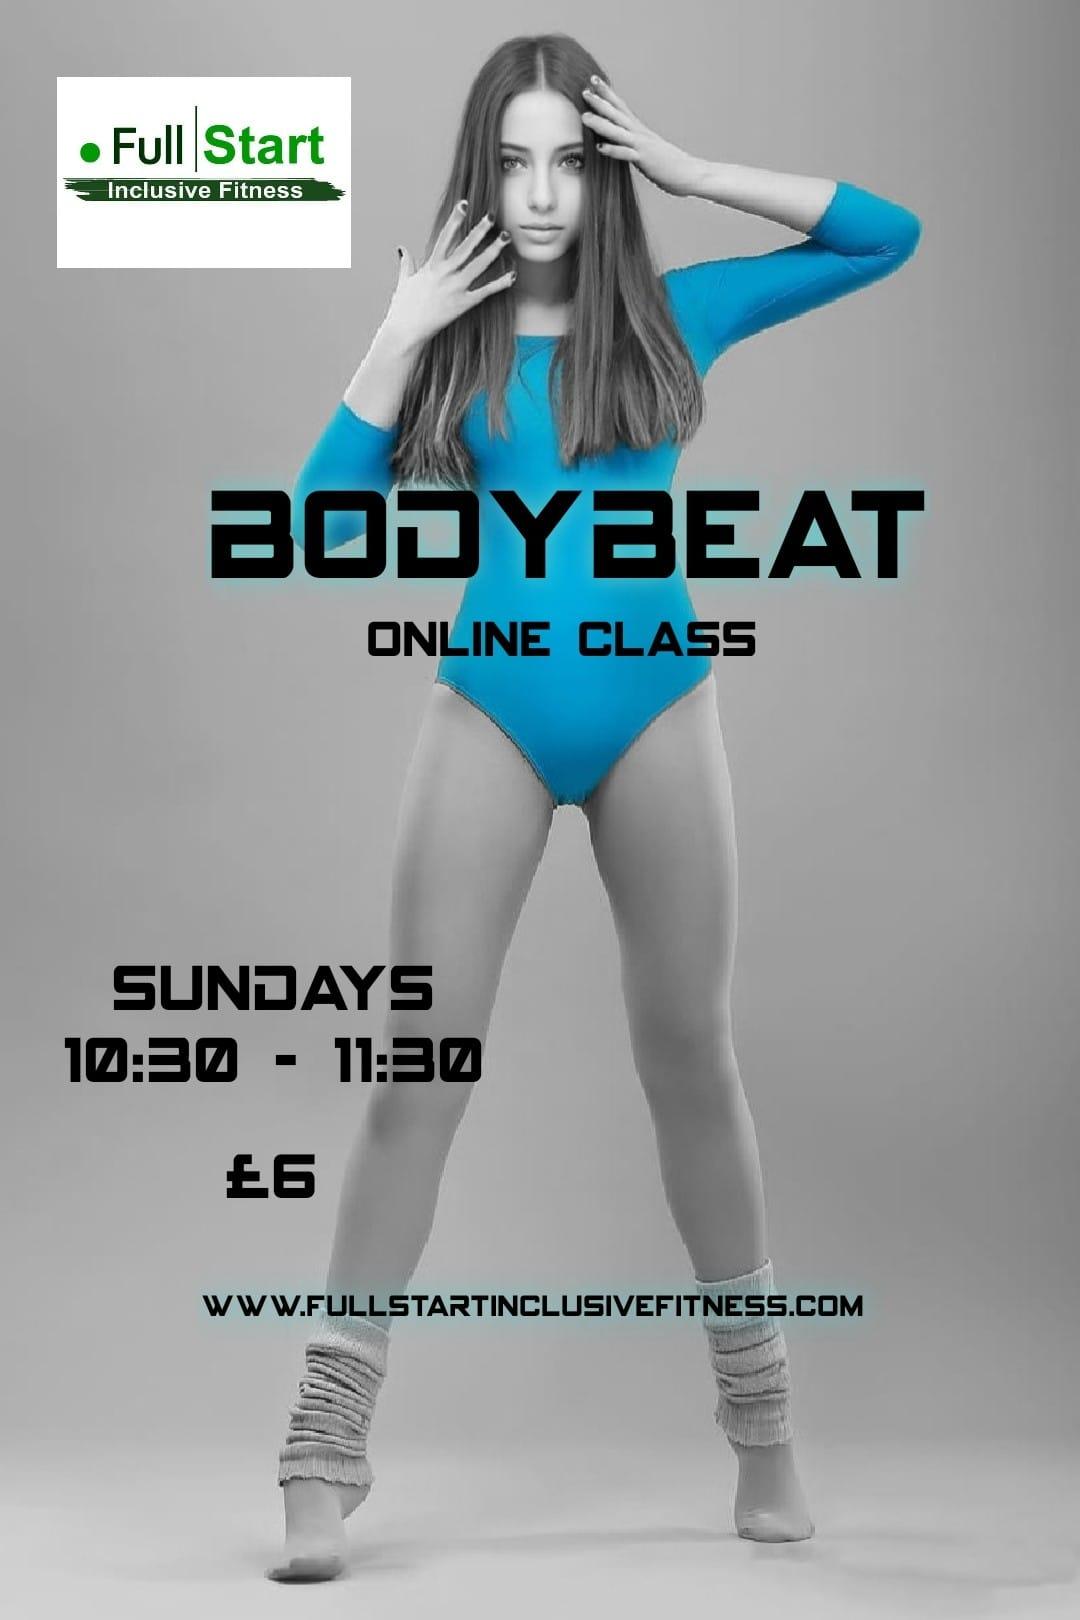 BodyBeat Fitness.jpg